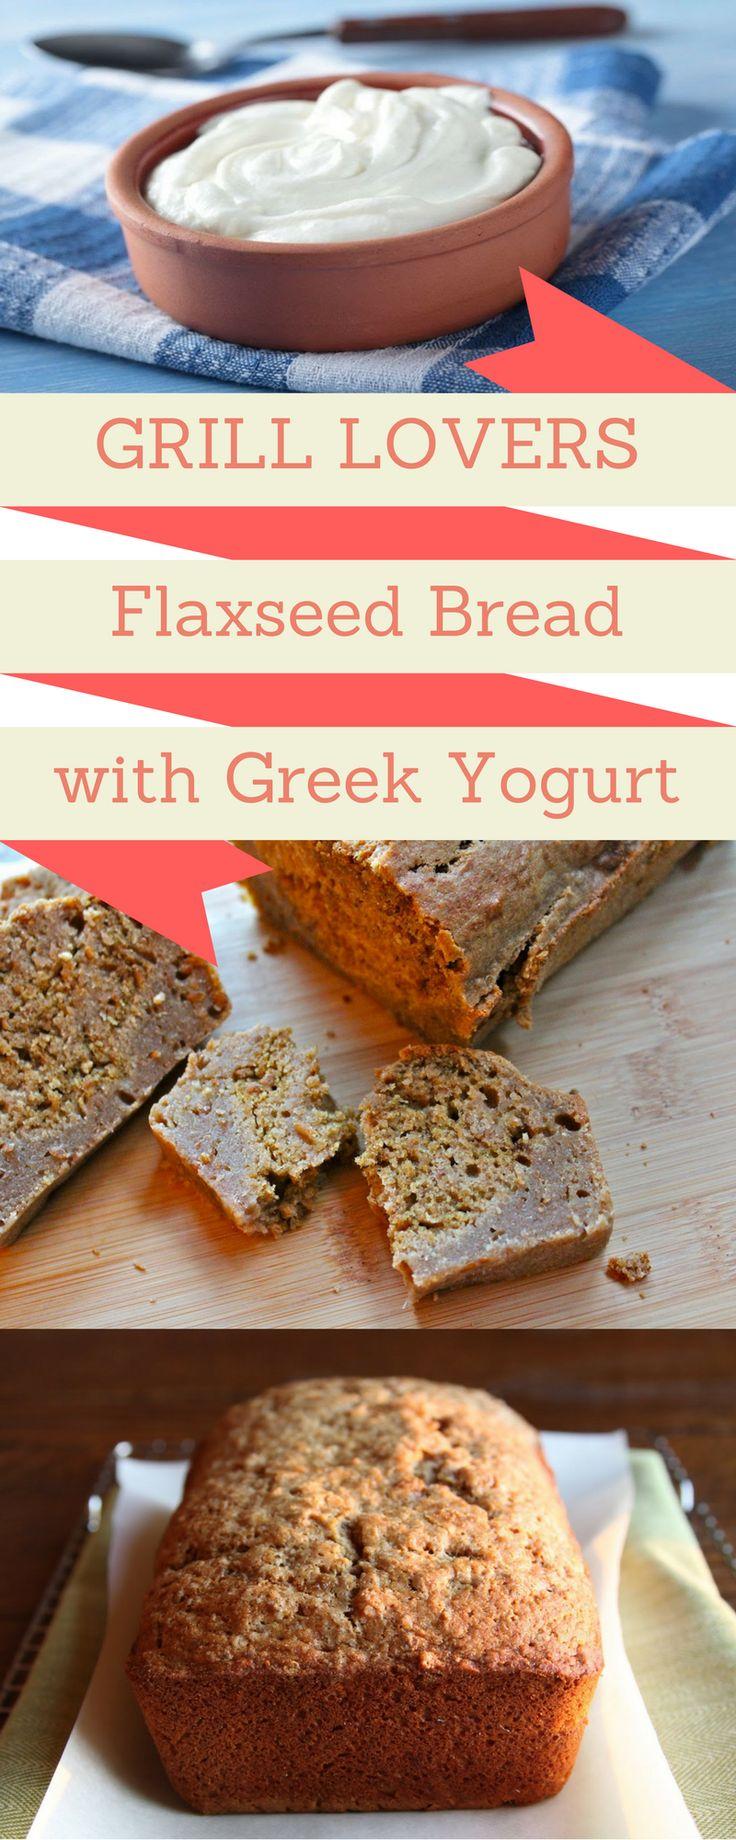 Grill Lovers' Amazing Flaxseed Bread with Greek Yogurt Recipe   #recipes #foodporn #foodie